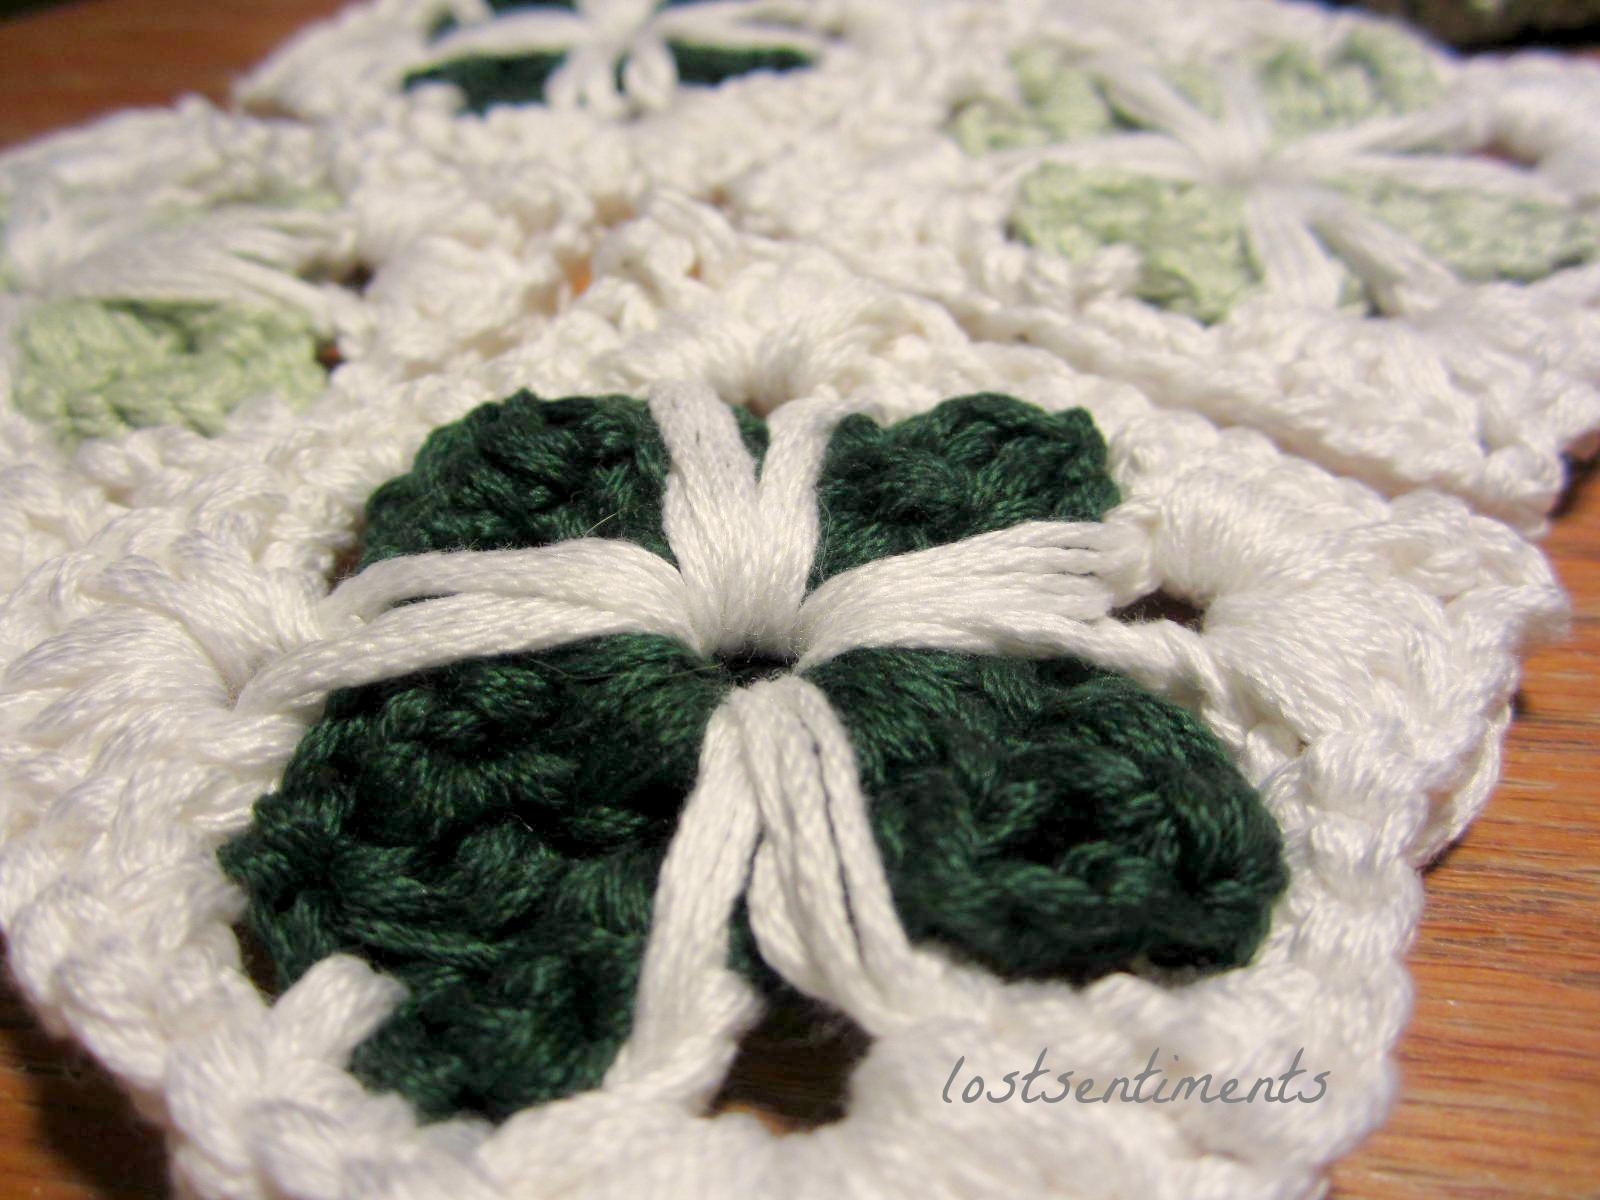 Free Amigurumi Leprechaun Pattern : Lostsentiments: cathedral motif granny square crochet free pattern